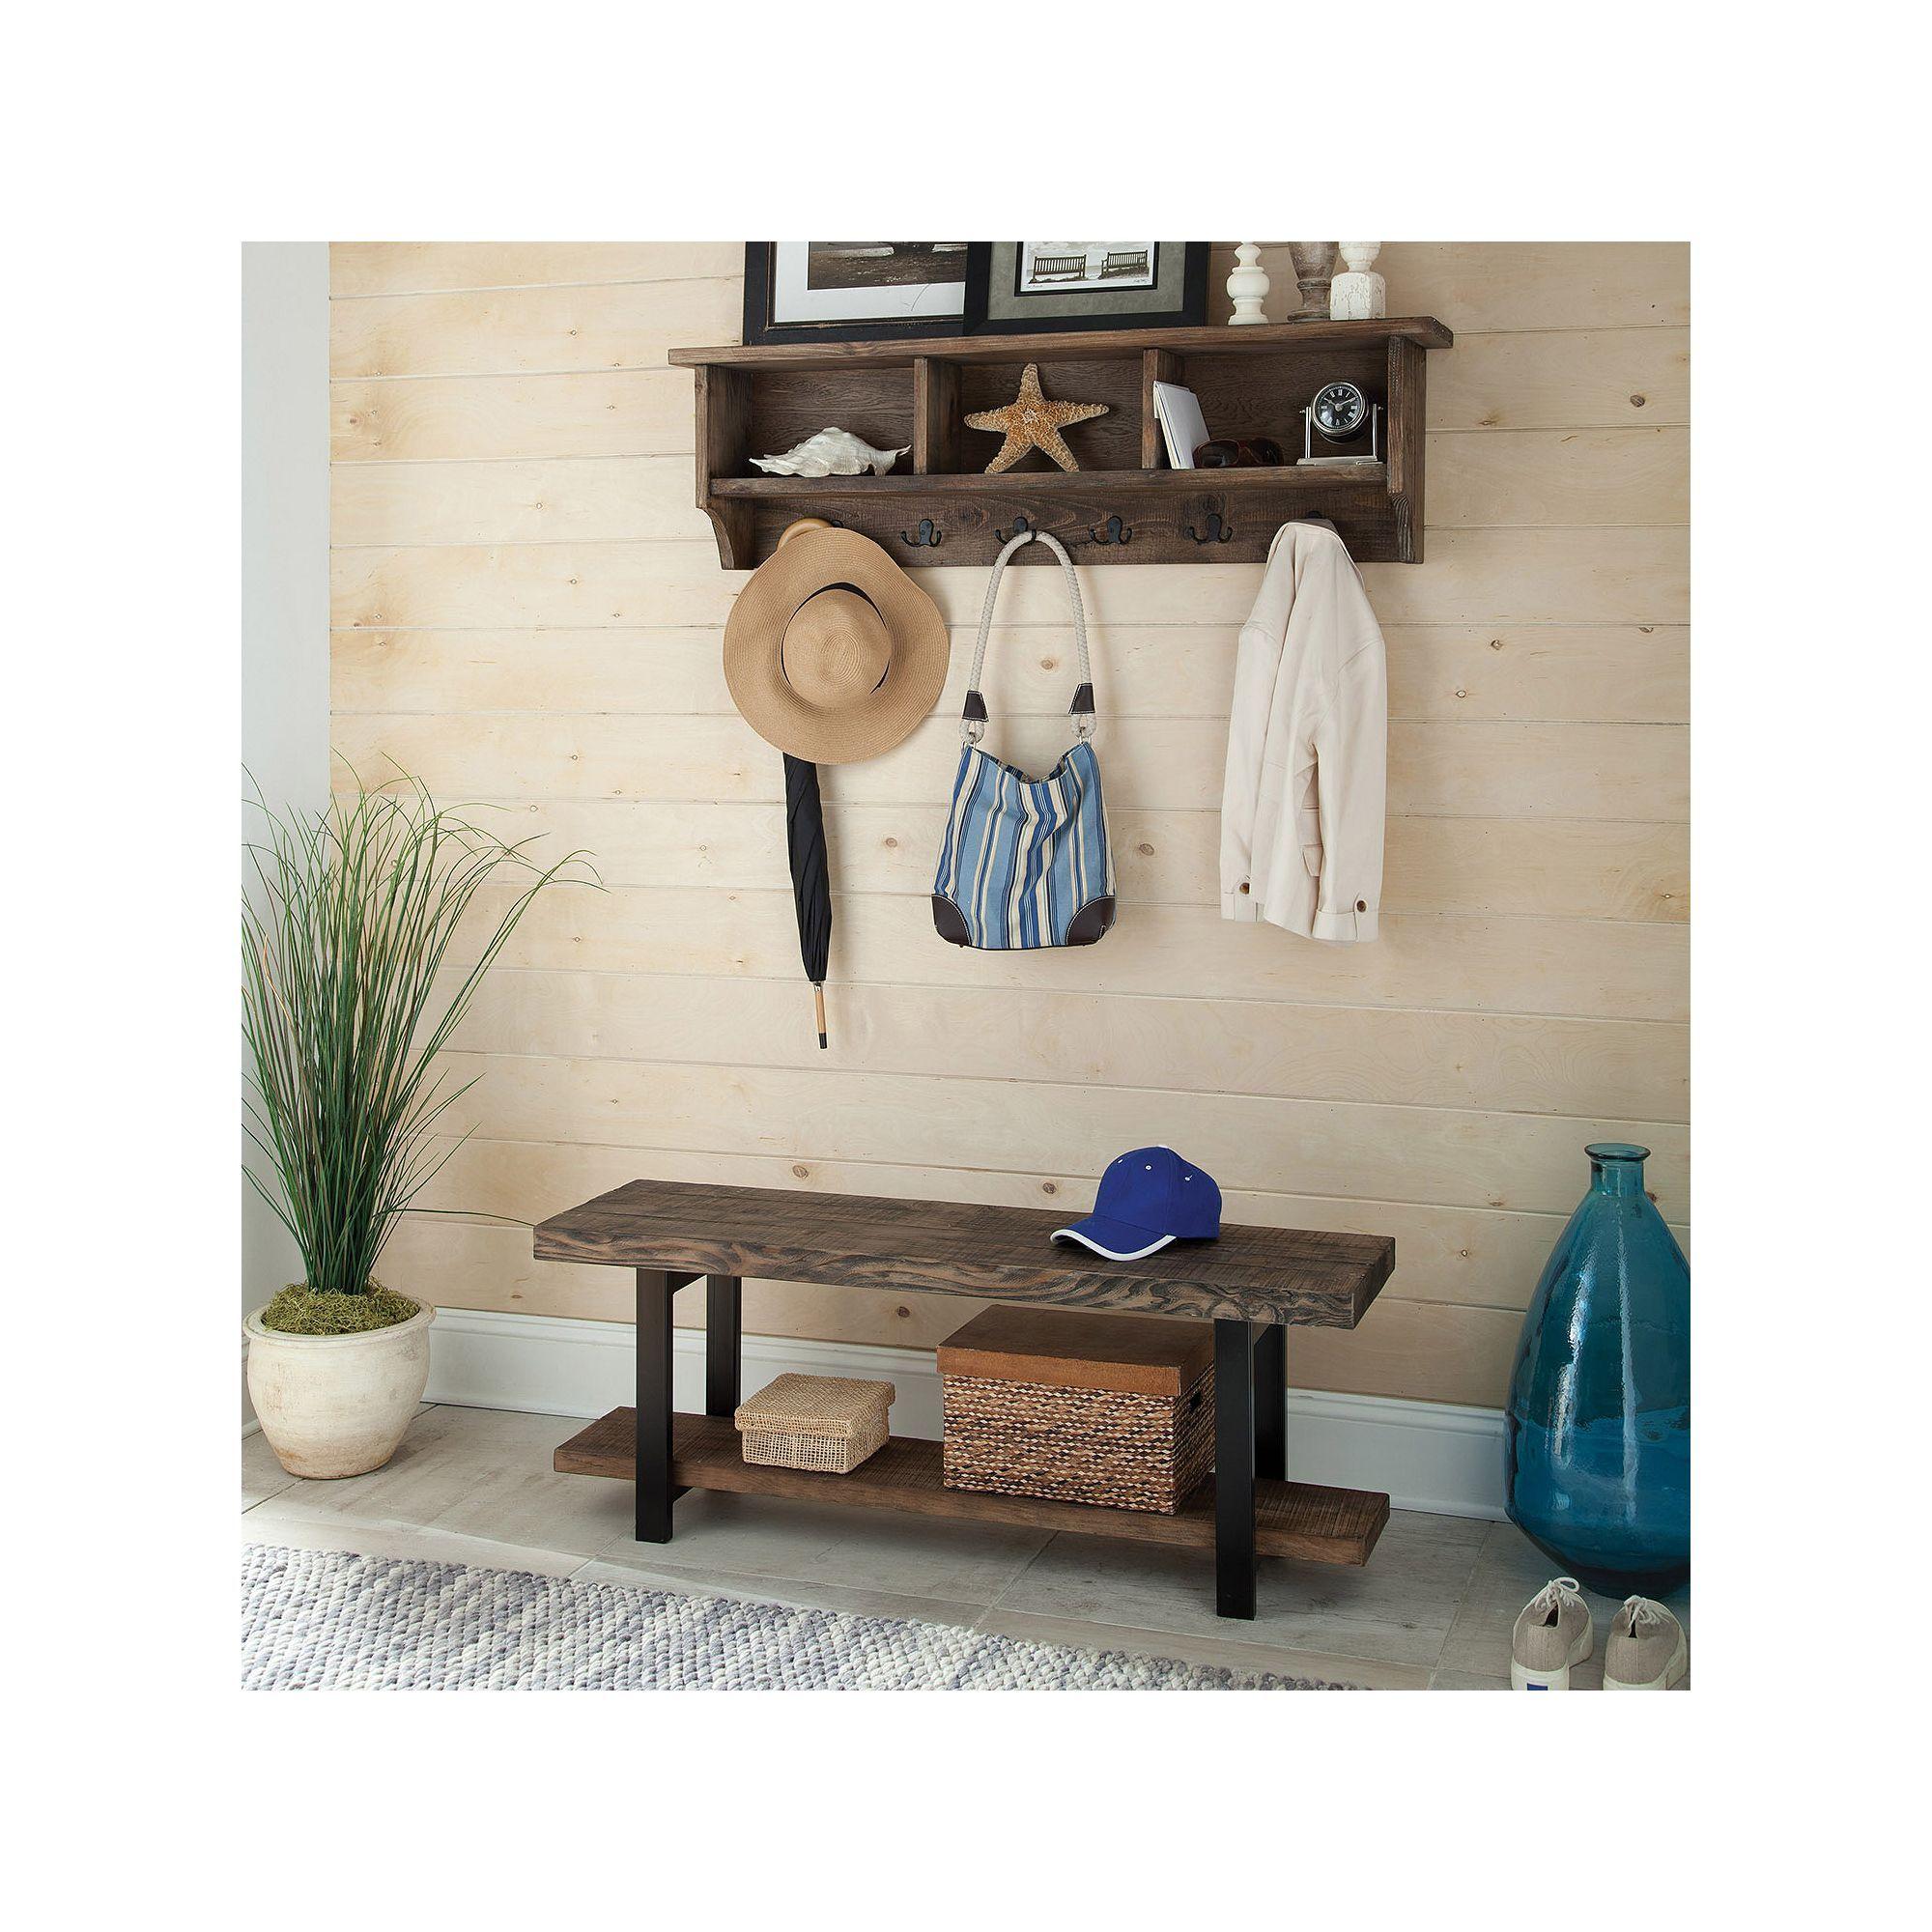 Alaterre Pomona Wood Bench & Coat Hook Cubby Wall Shelf 2-piece Set ...